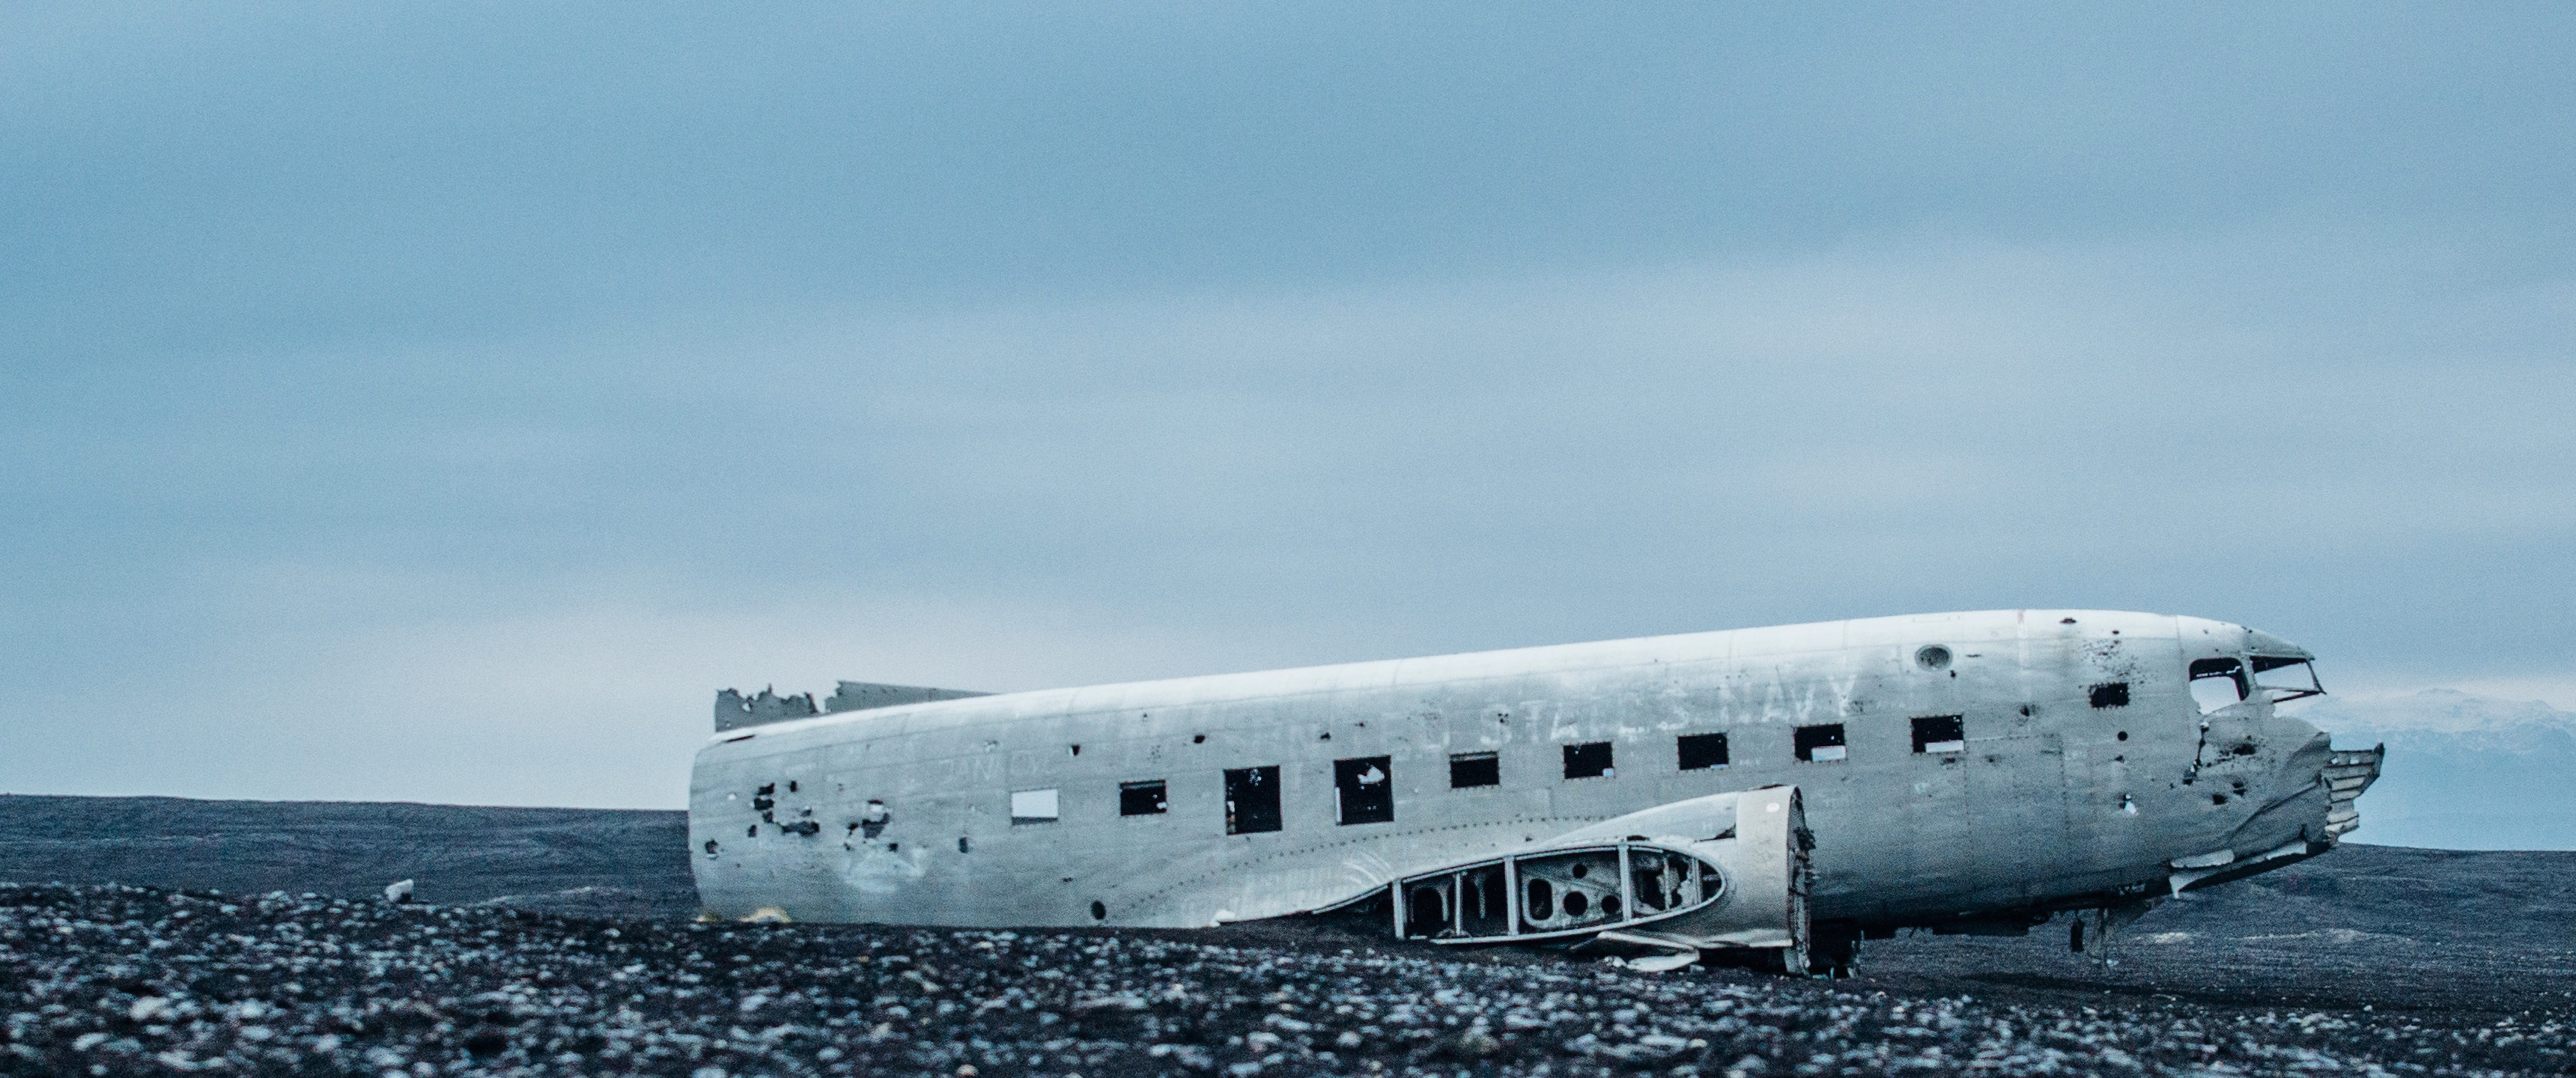 Abandoned Flight – 21:9 Ultrawide HD Wallpaper (3440×1440)